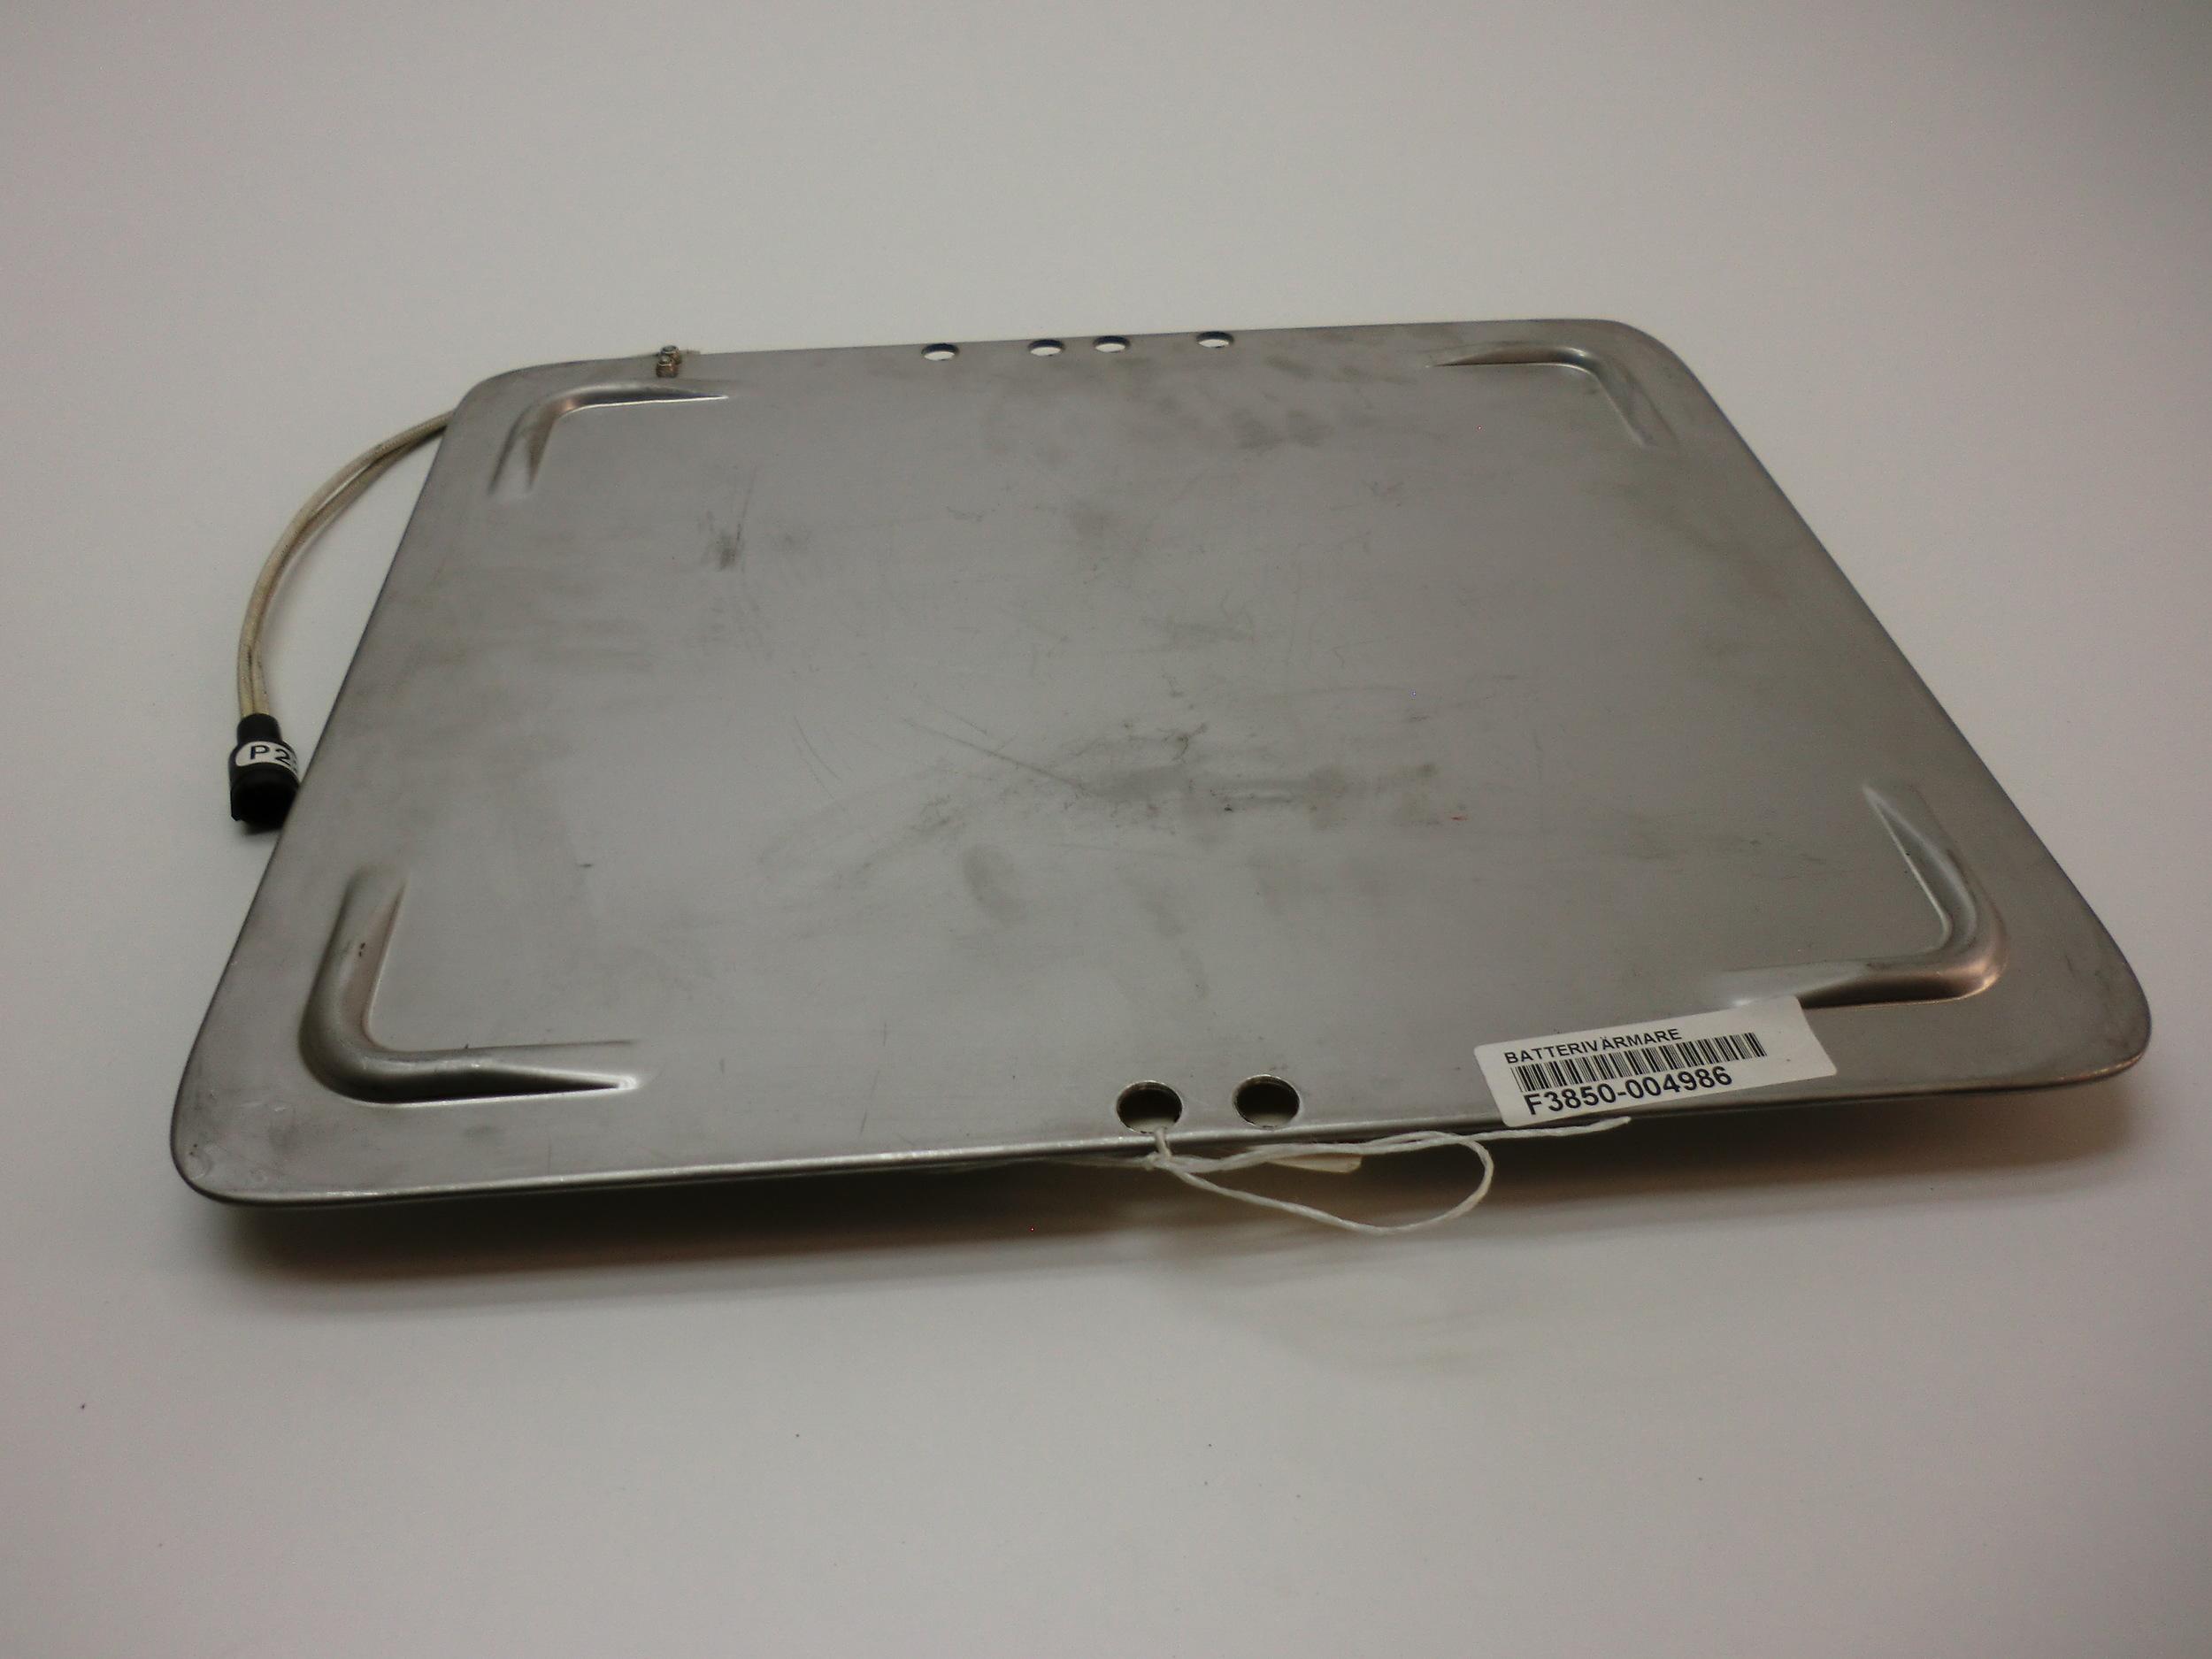 Battery Heater häggo Nr: 153 6006-801 price: 5200 sek